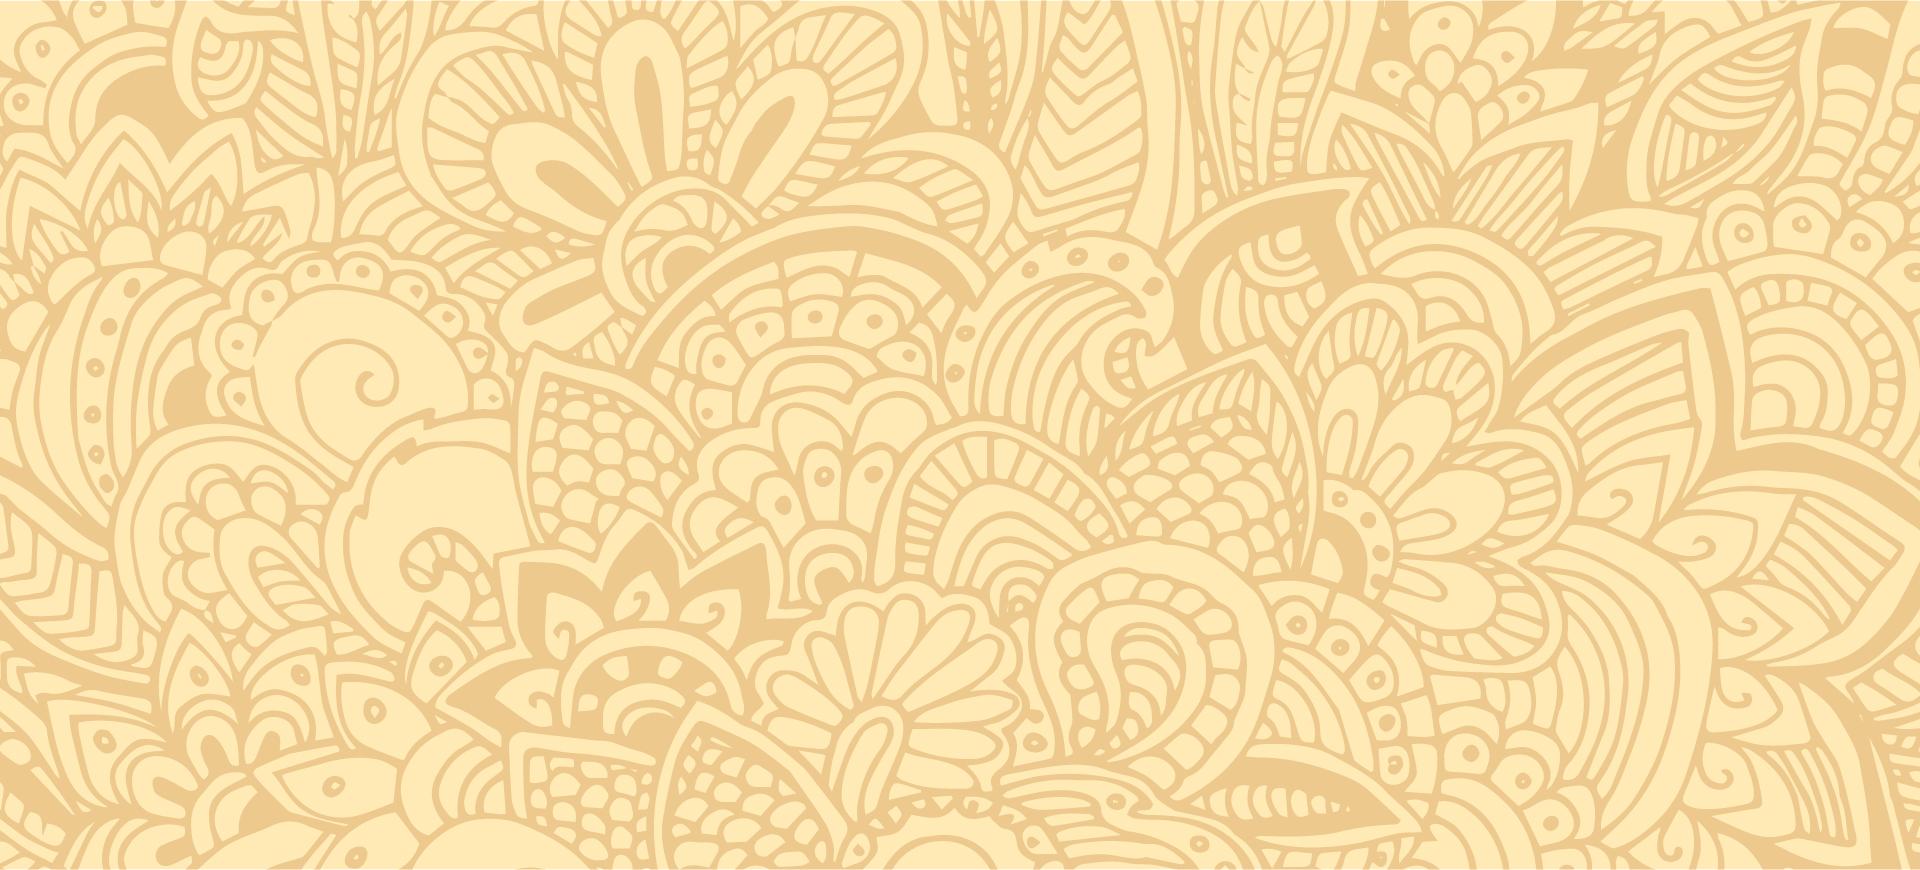 sans soudure sch u00e9ma floral tissu contexte r u00e9tro tile le